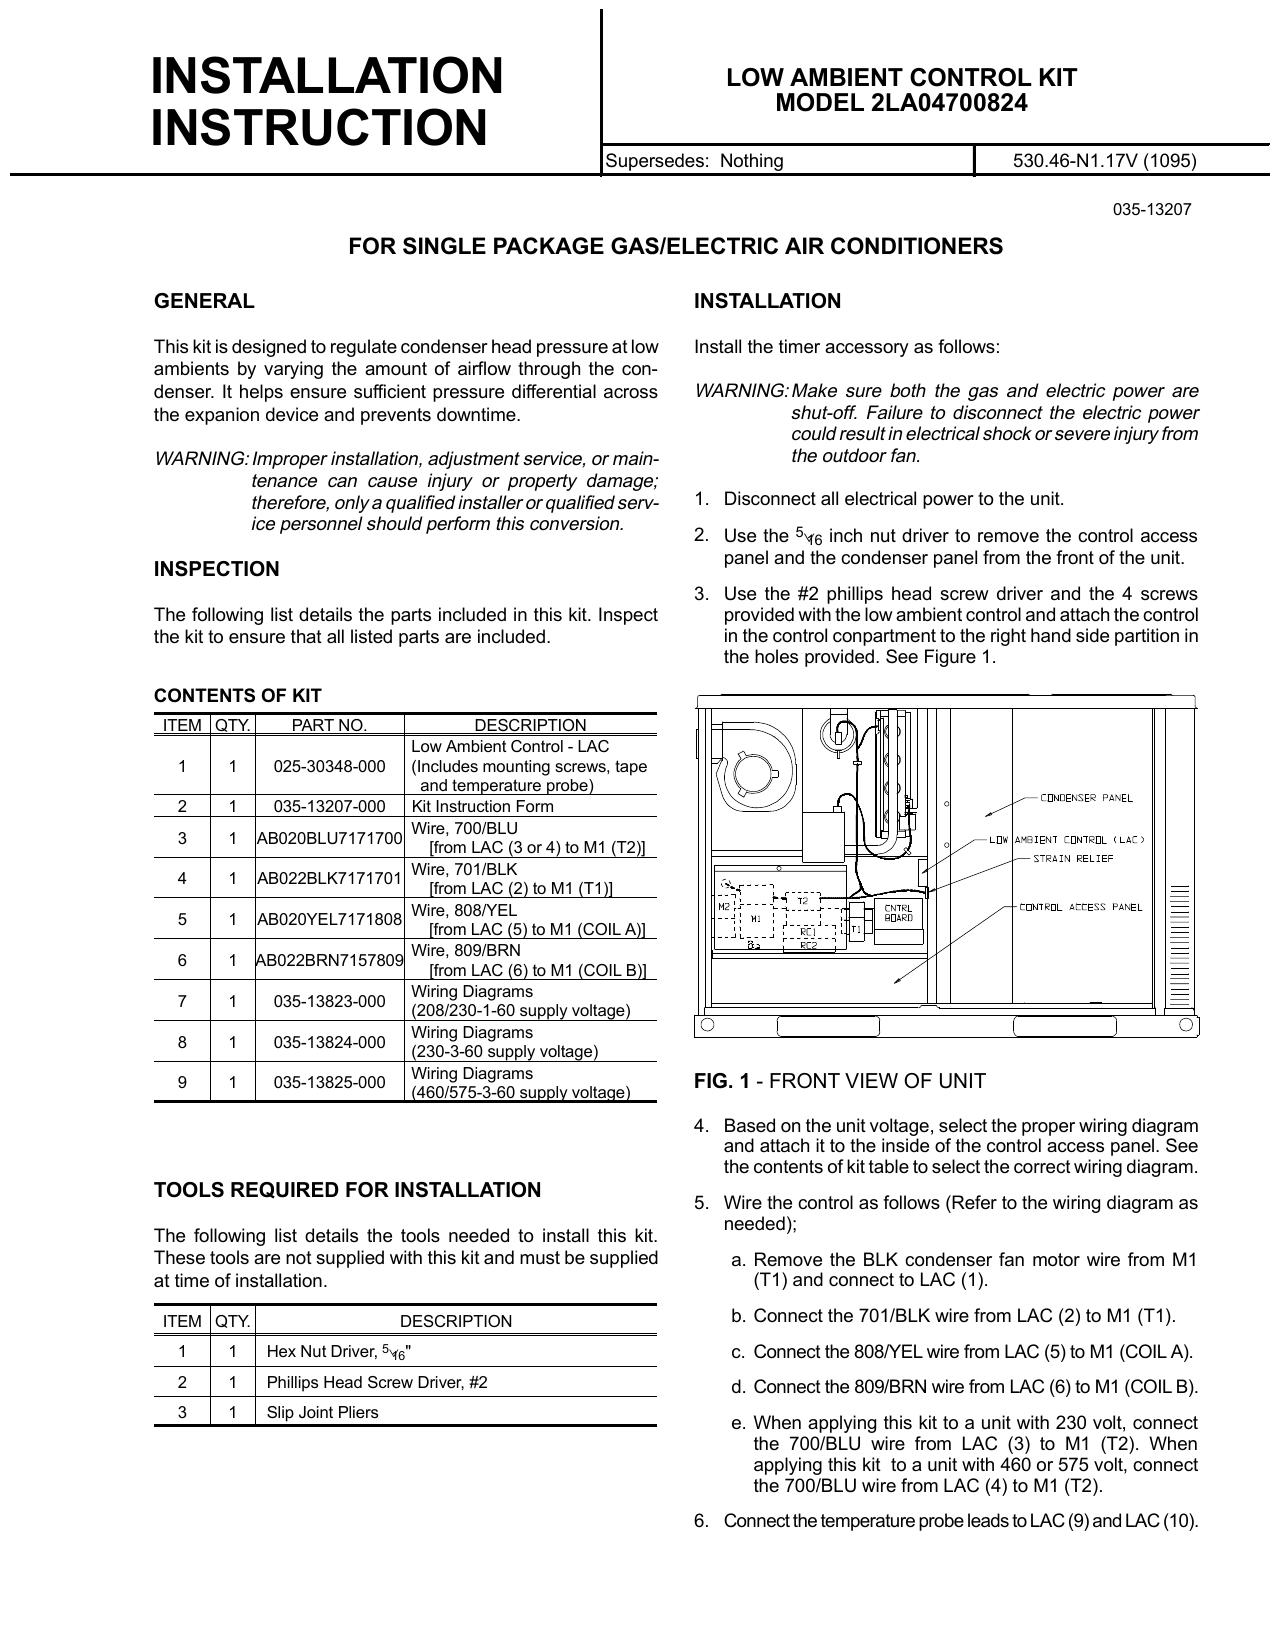 hight resolution of 5 wire condenser fan motor diagram